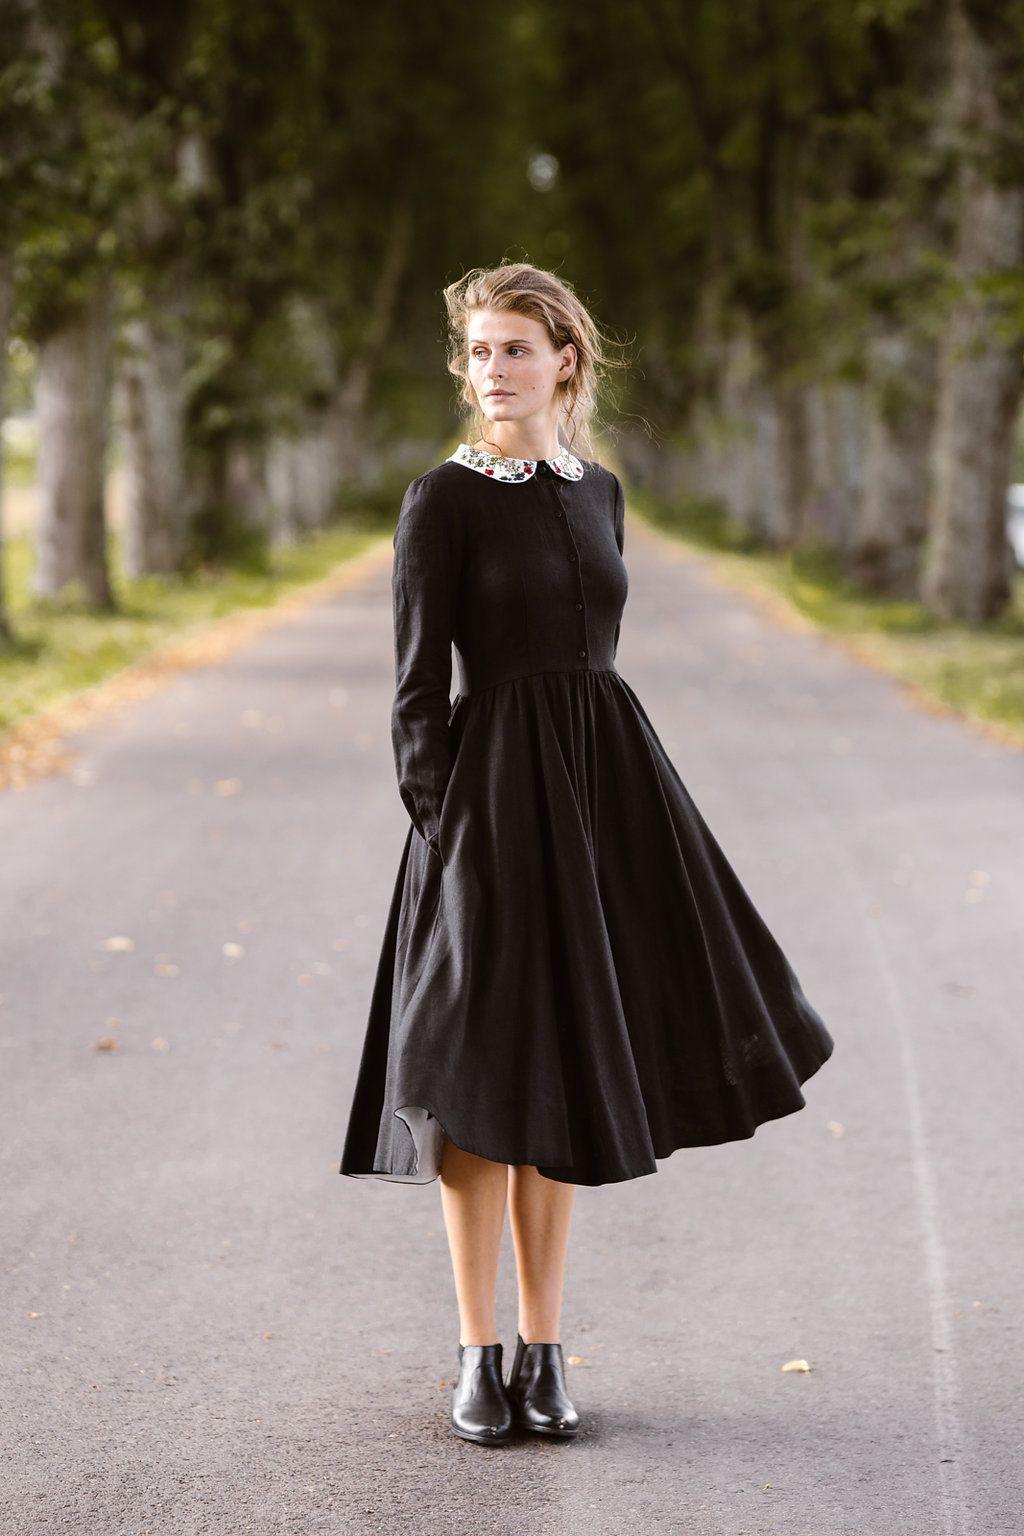 Sondeflor Classic Dress Linen Dress Black Dress Vintage Etsy Black Linen Dress Vintage Black Dress Classic Dress [ 1536 x 1024 Pixel ]